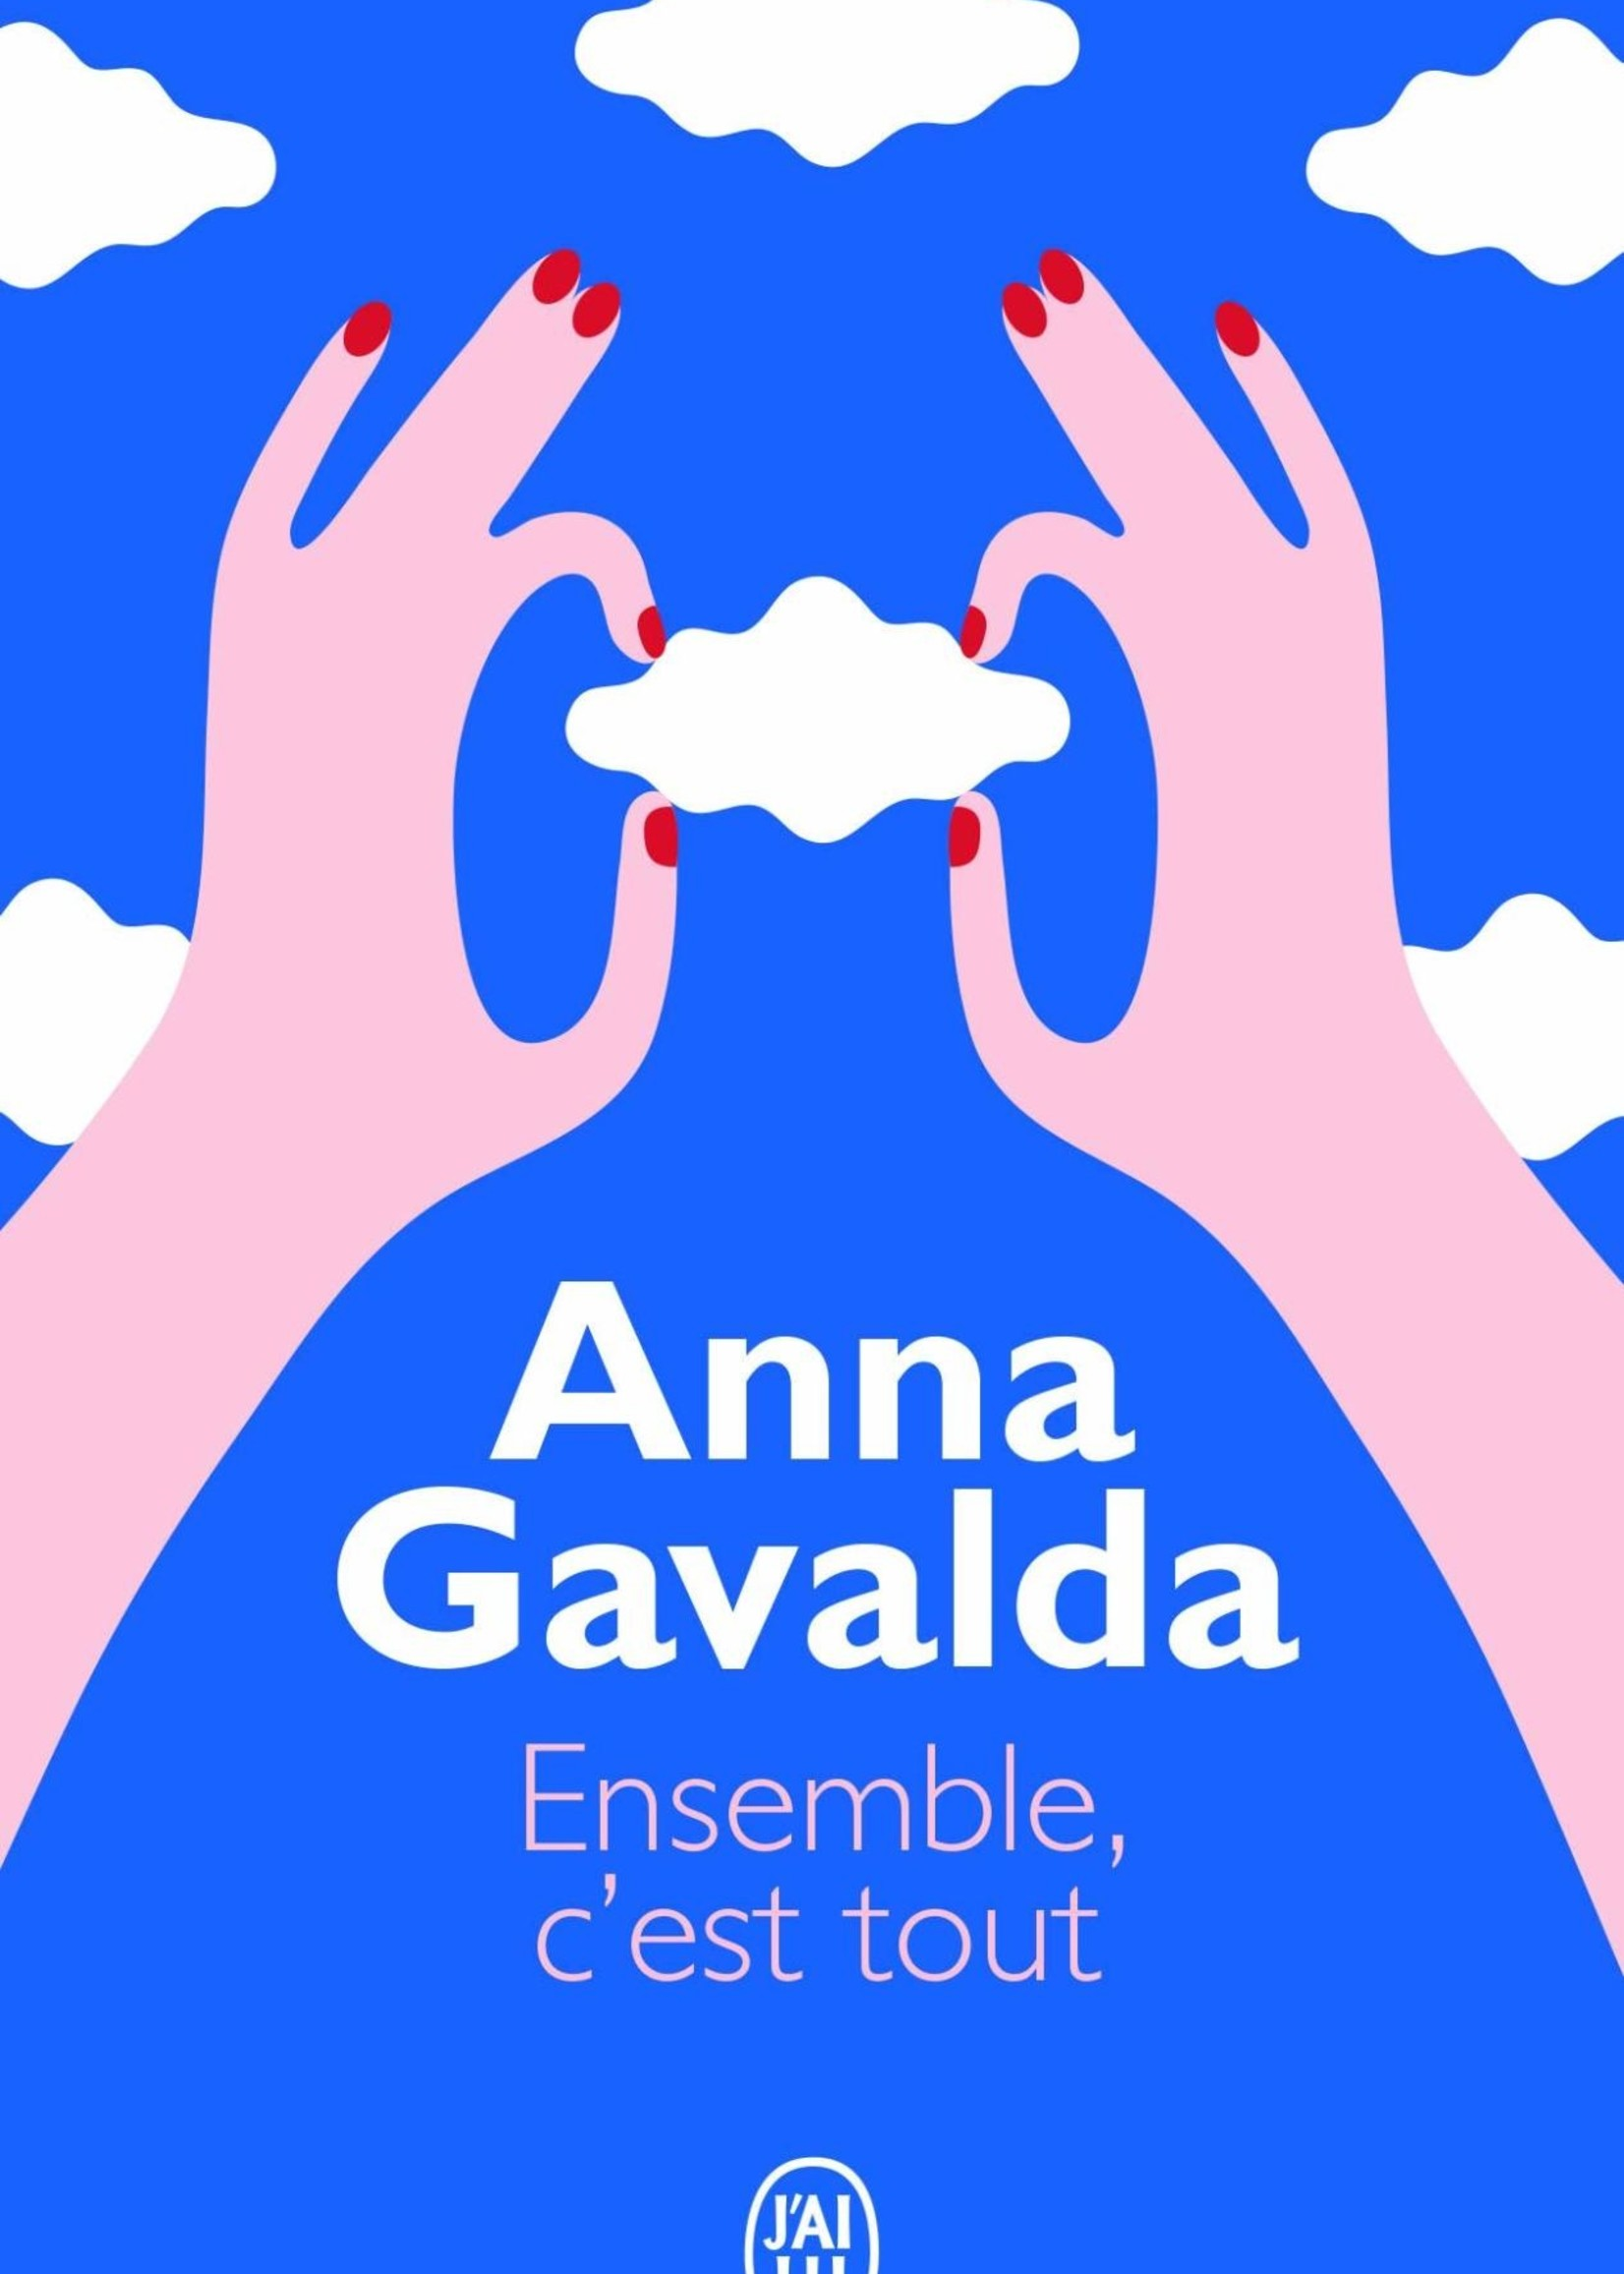 Ensemble, c'est tout by Anna Gavalda